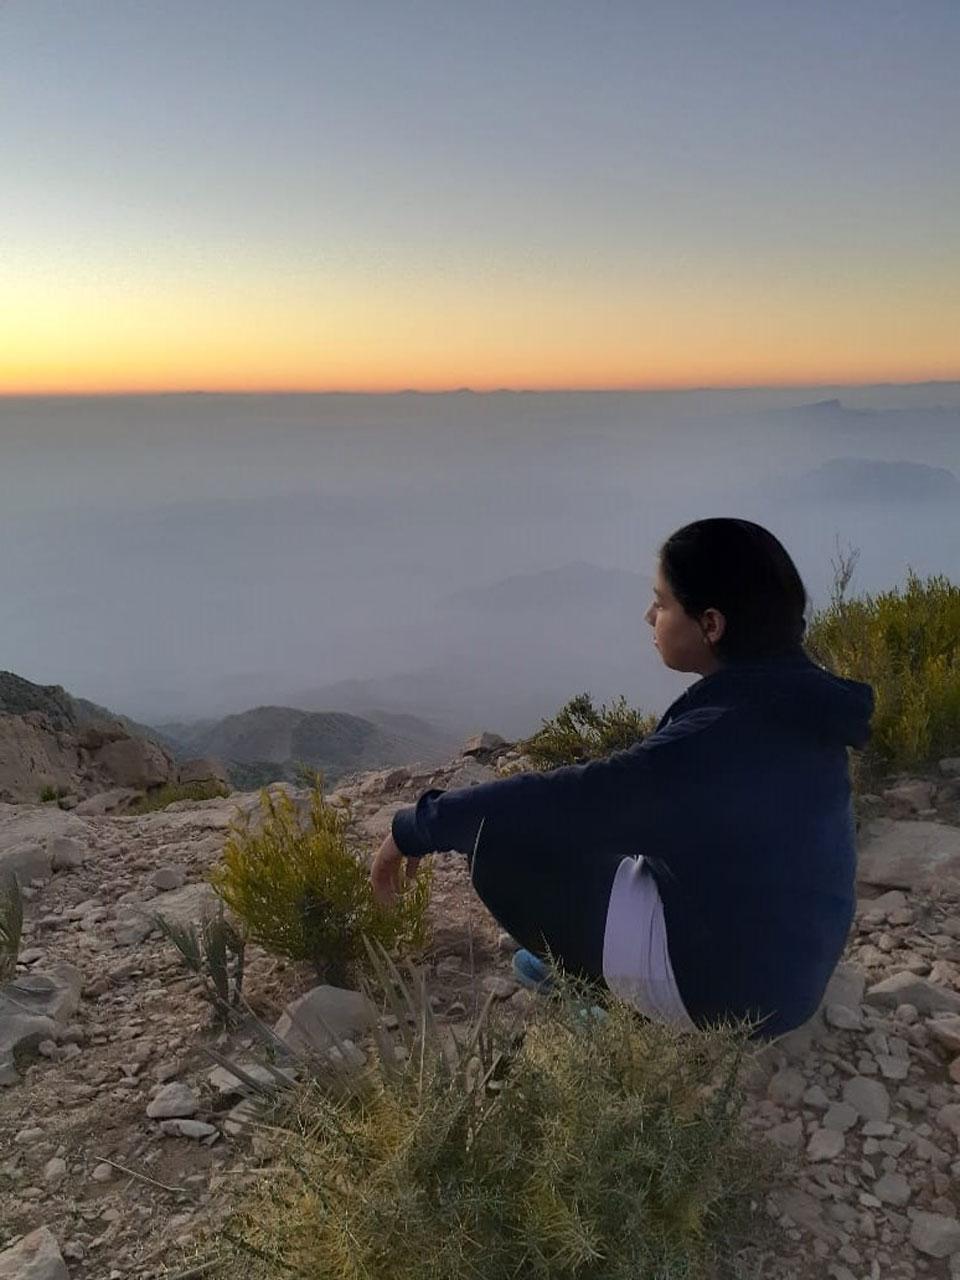 Zoya is admiring the horizon line